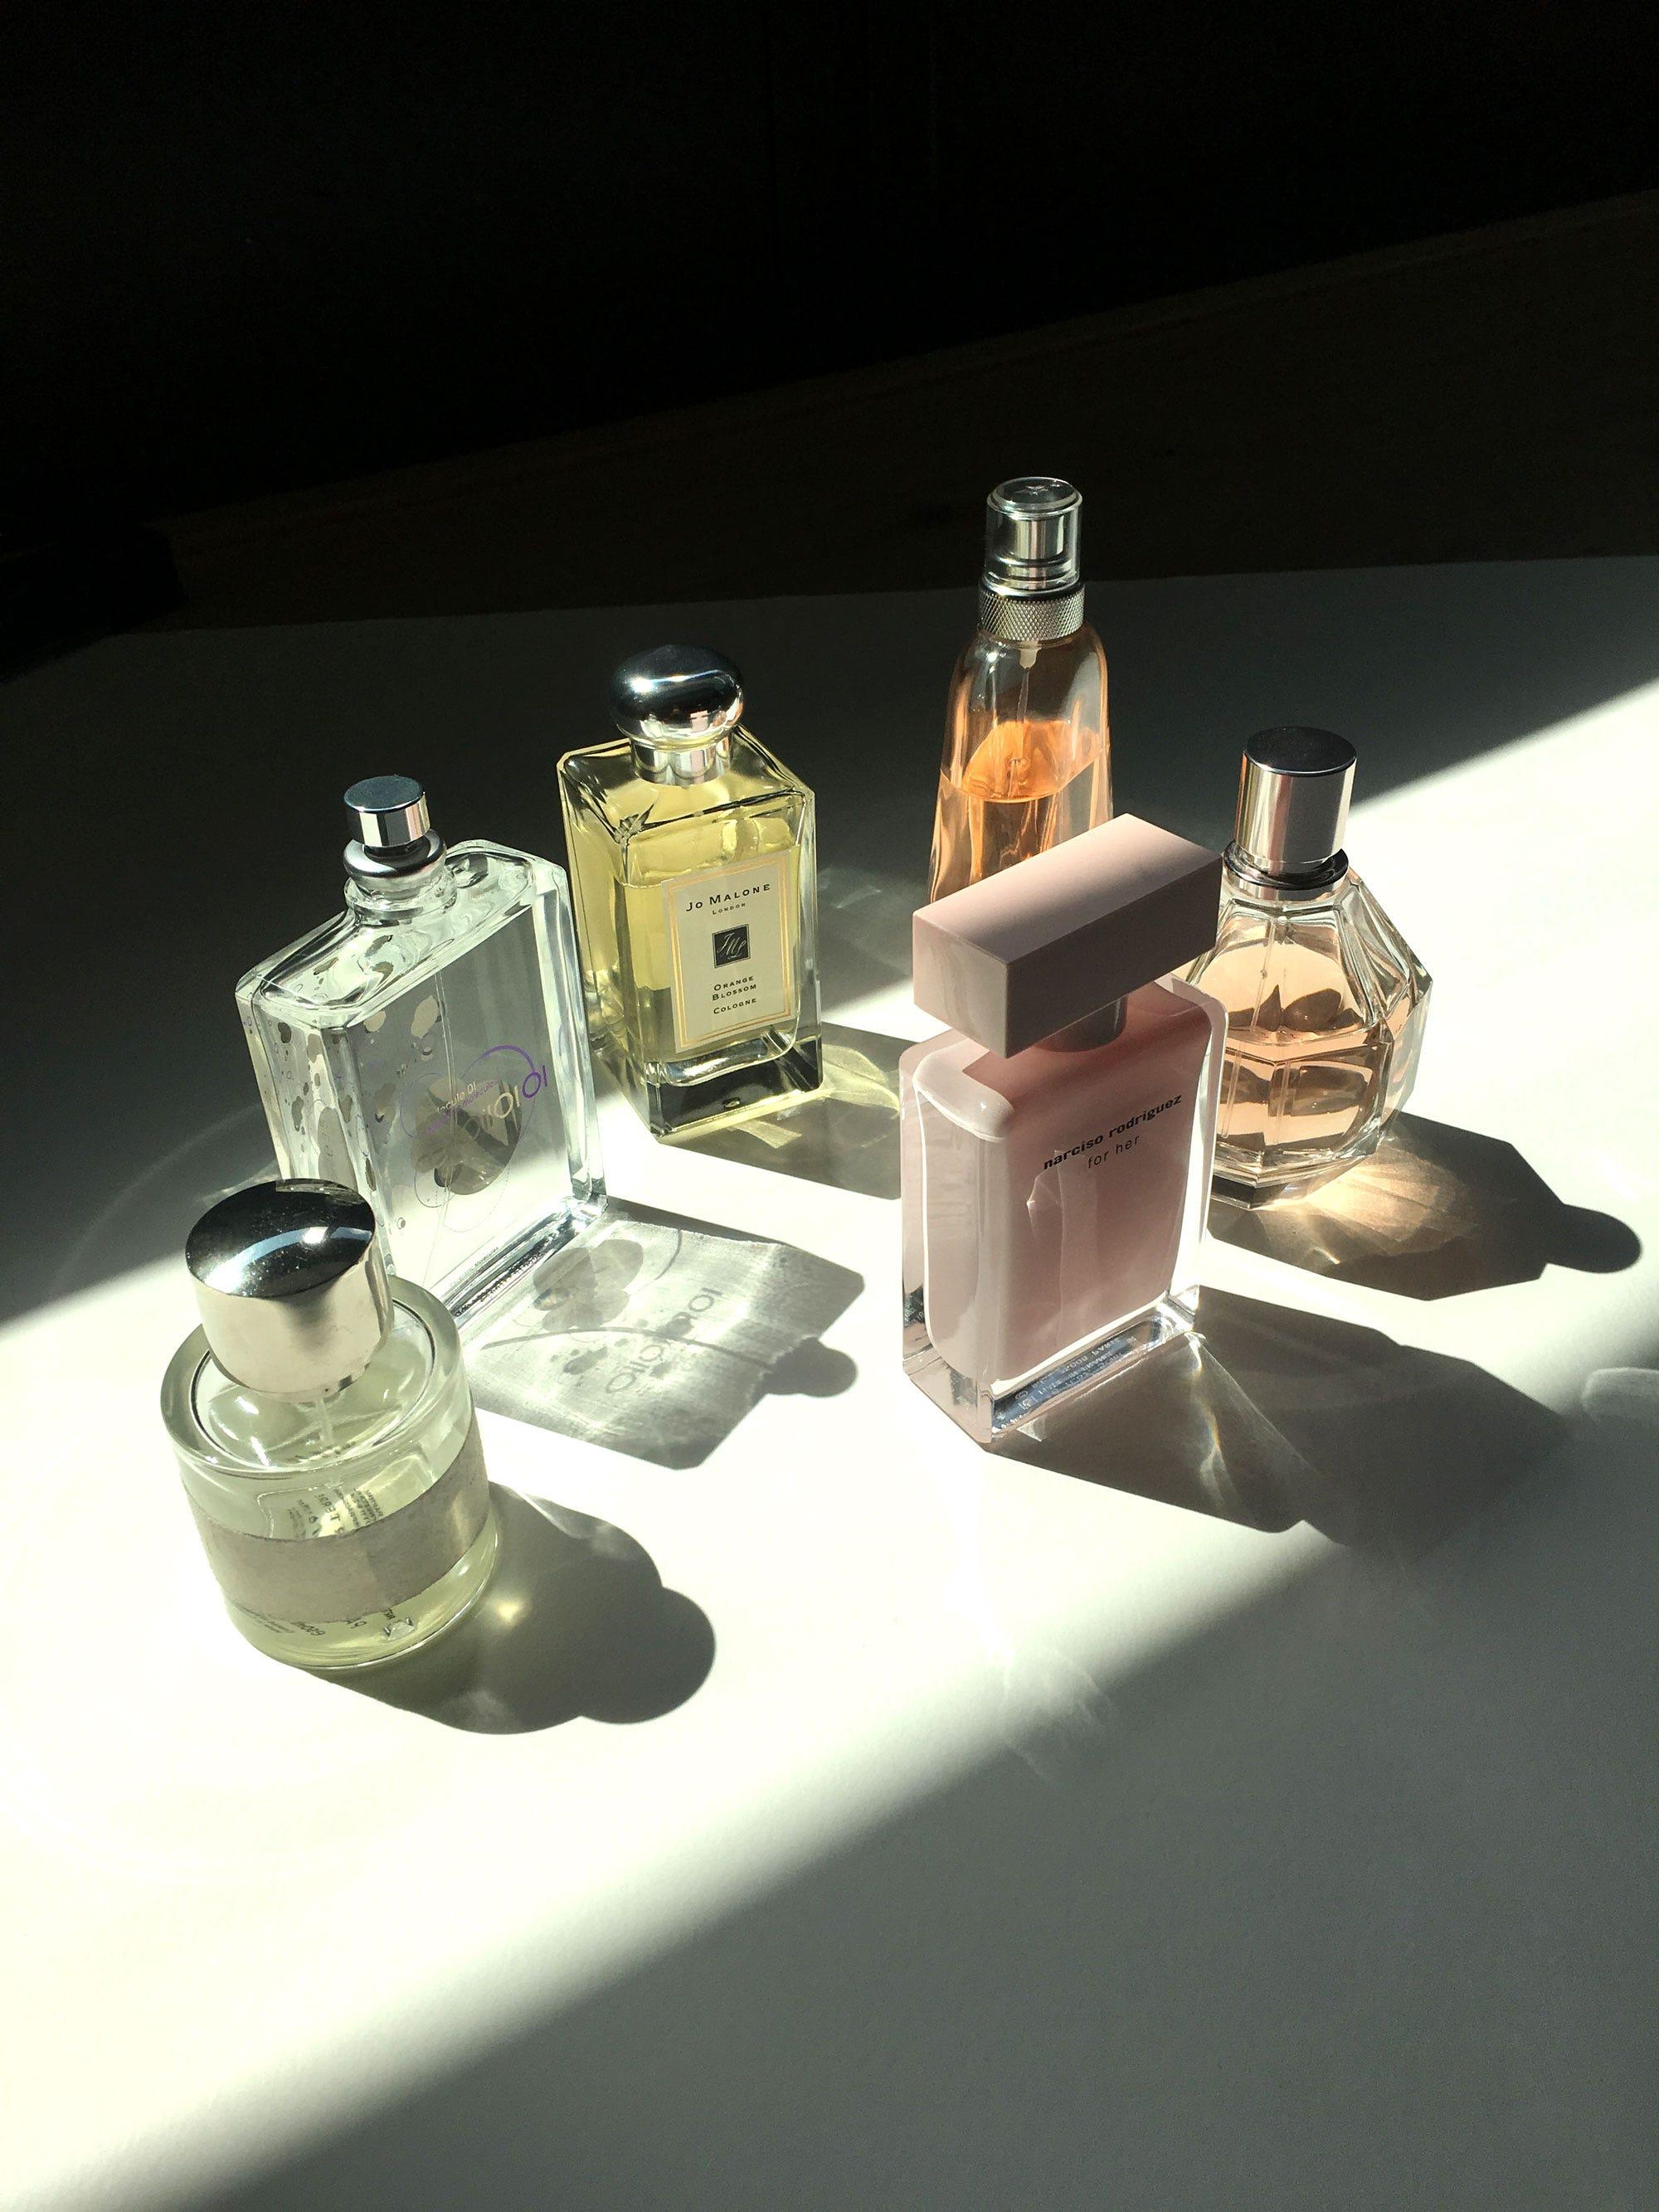 Best Perfumes Fragrances For Women 2019